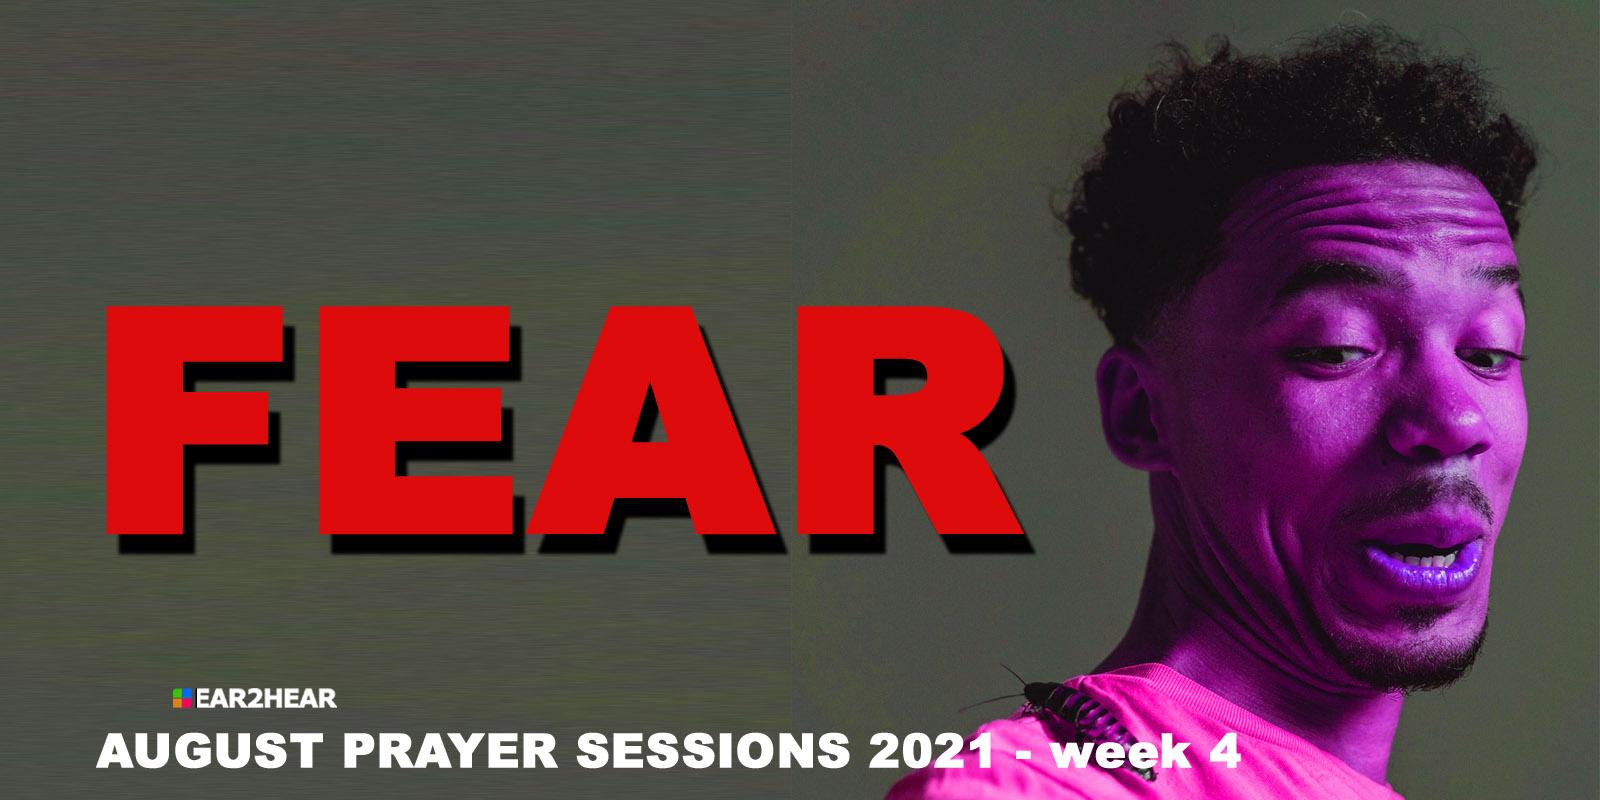 PRAY: AUGUST PRAYER SESSIONS 2021 – WEEK 4 DOWNLOAD FREE DEVOTION